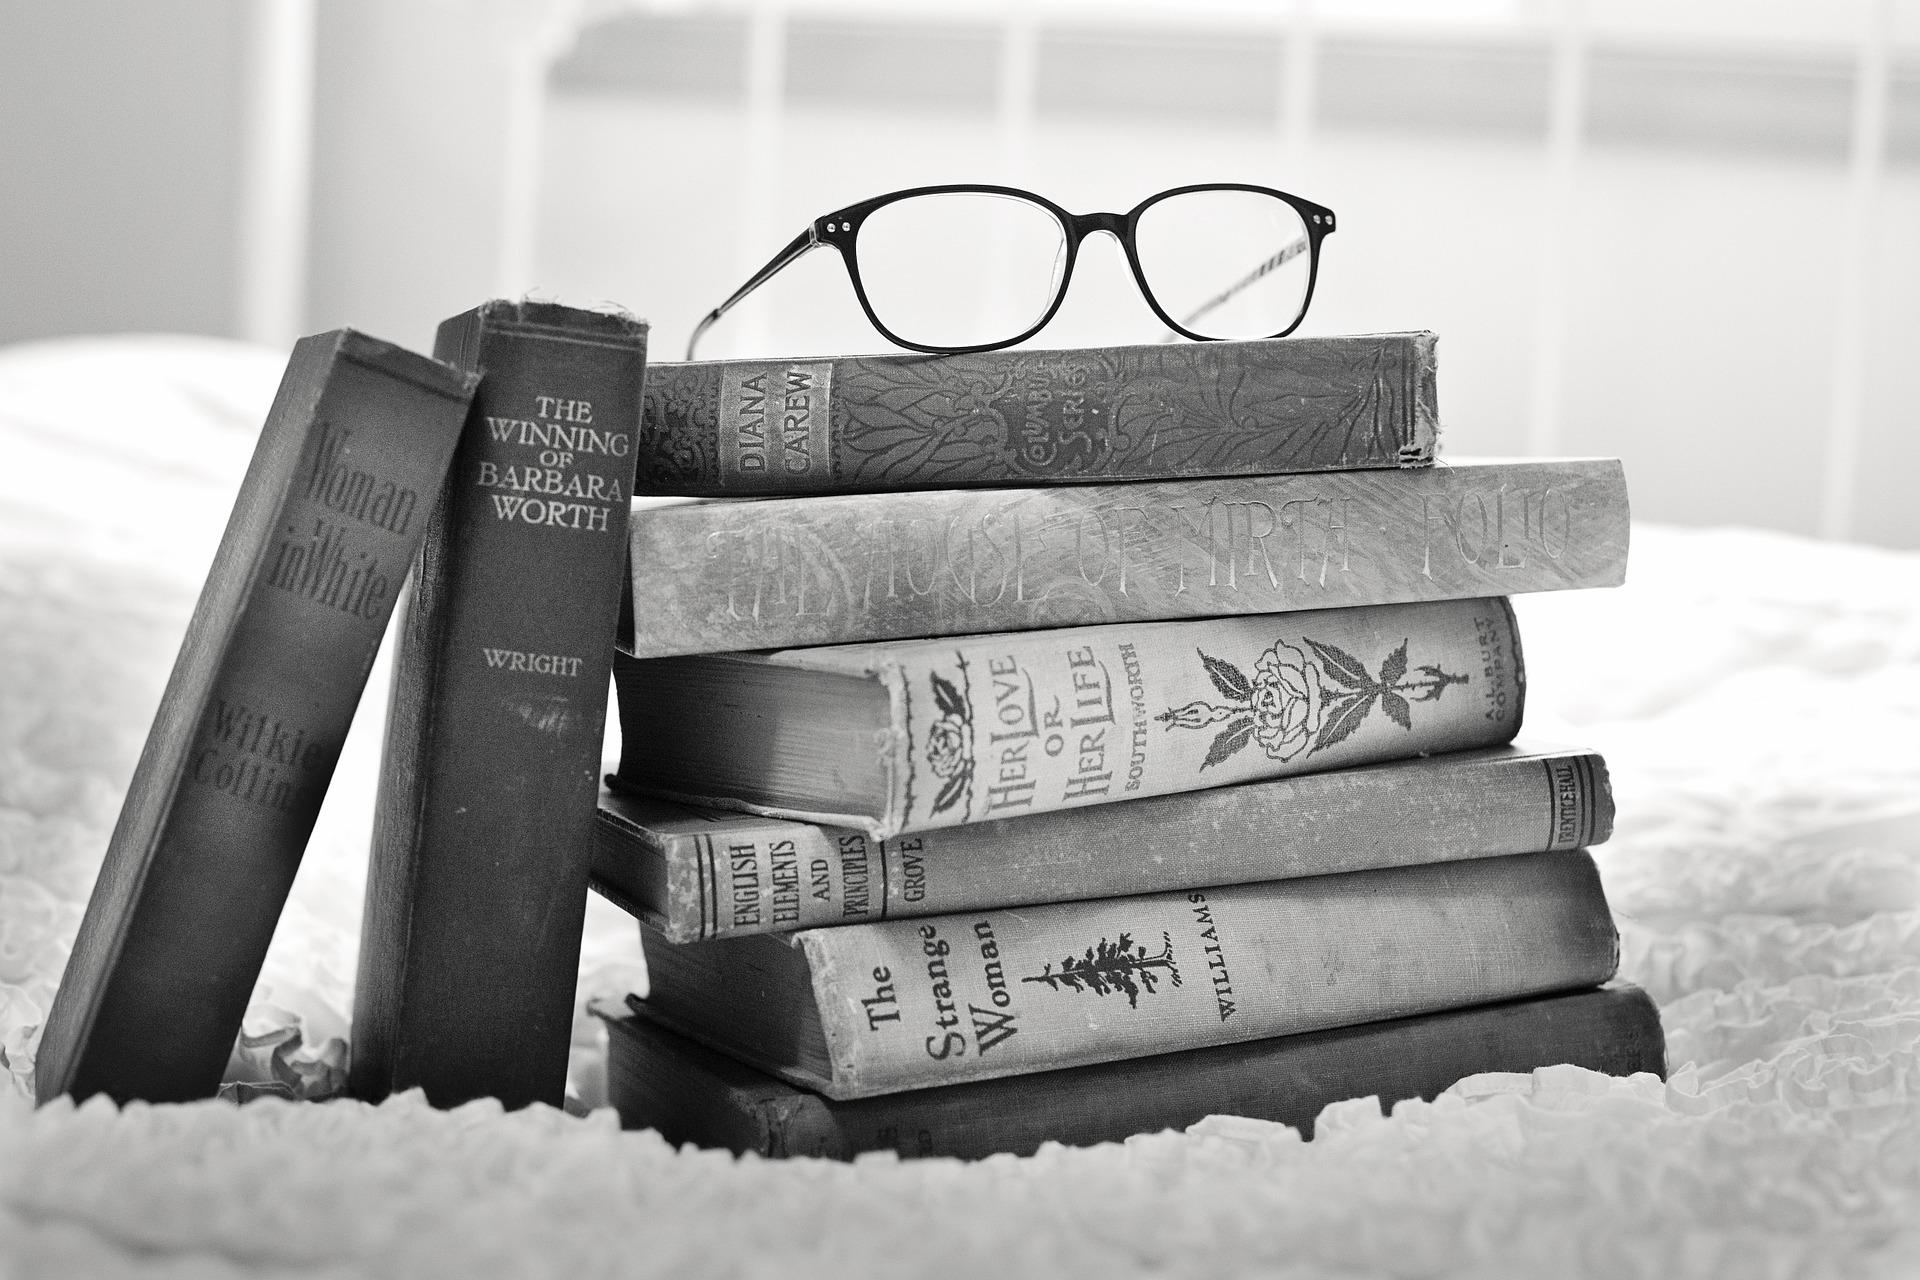 stack-of-books-1001655_1920.jpg